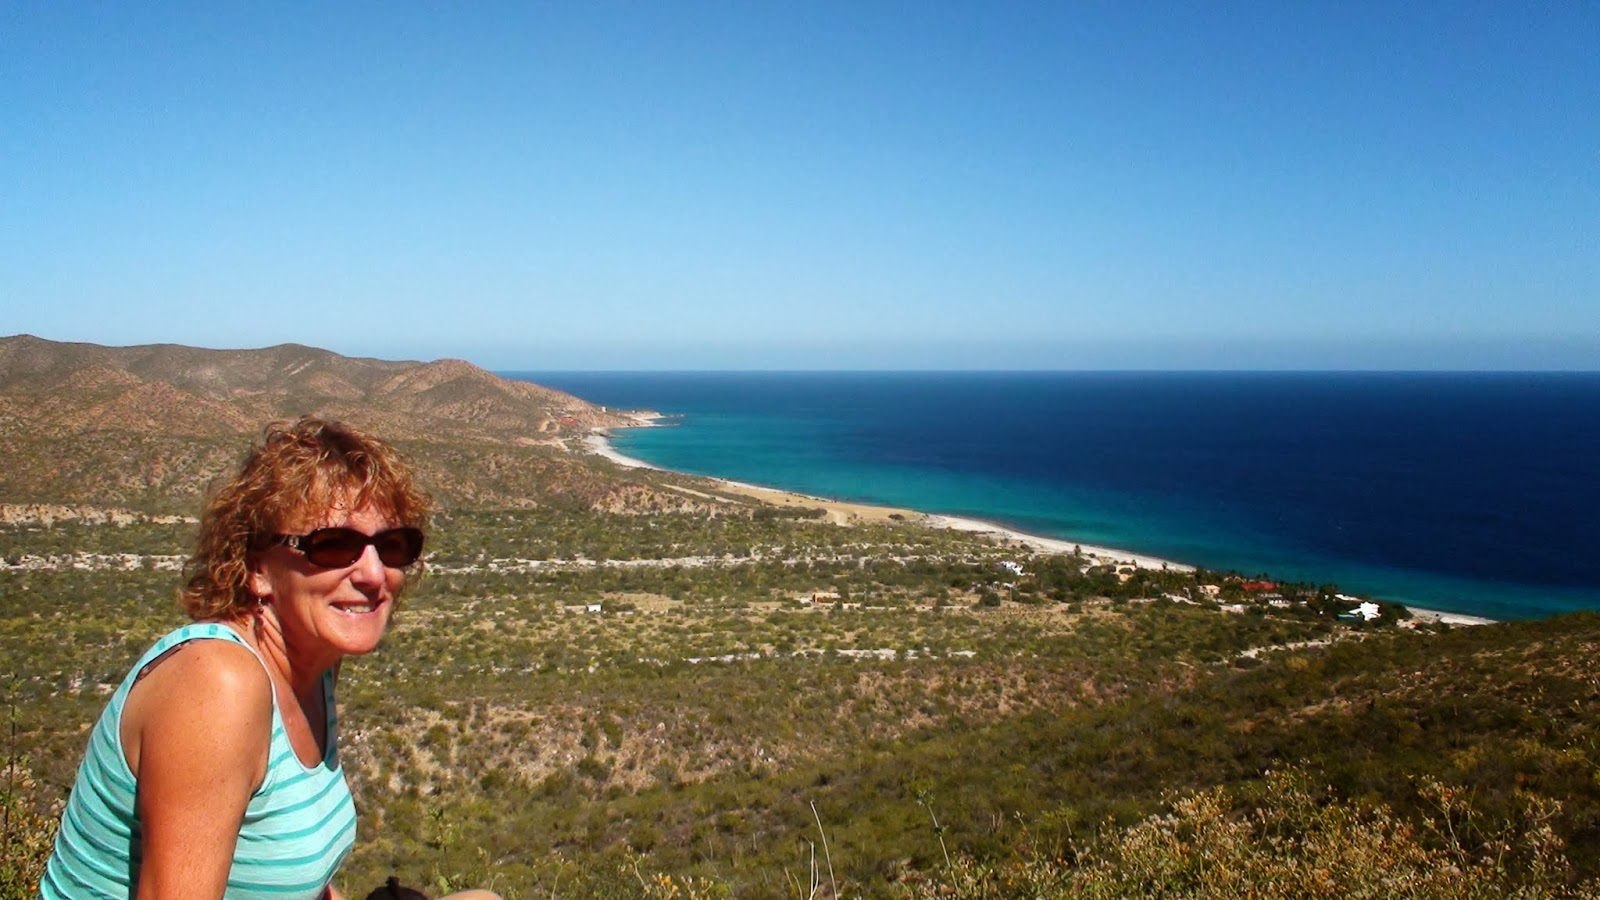 Liz outside Los Barriles, Baja California, Mexico